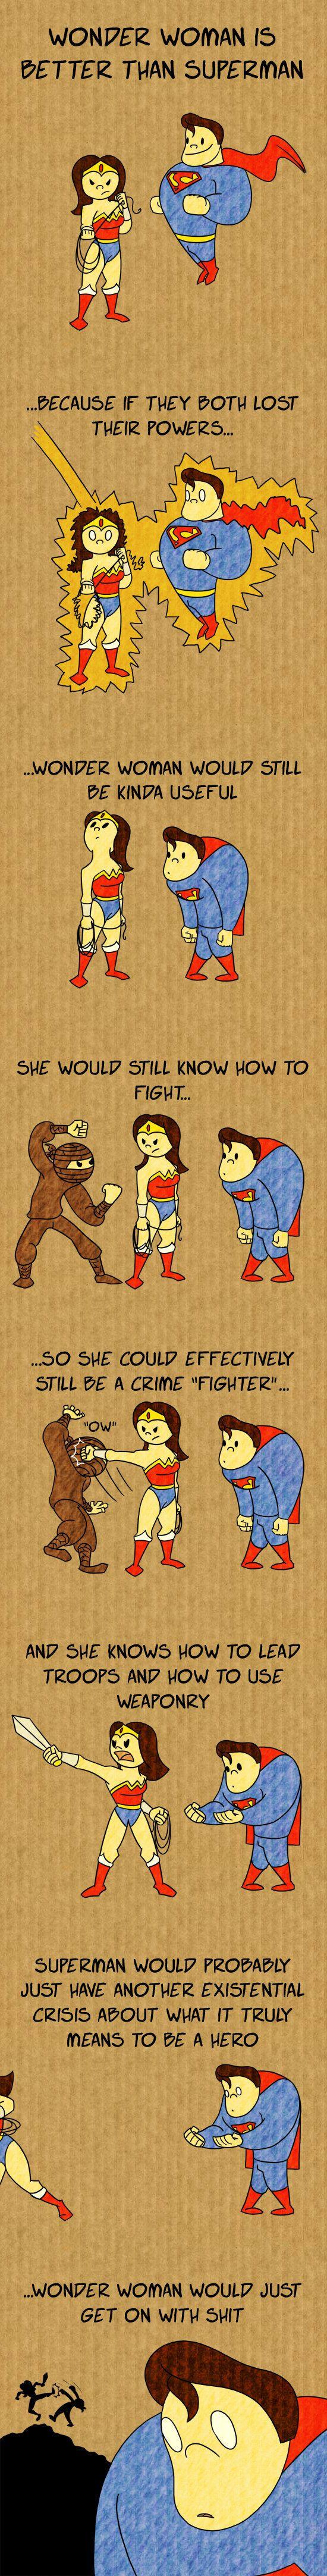 Wonder Woman is better than Super Man by ~spaced-brain on deviantART